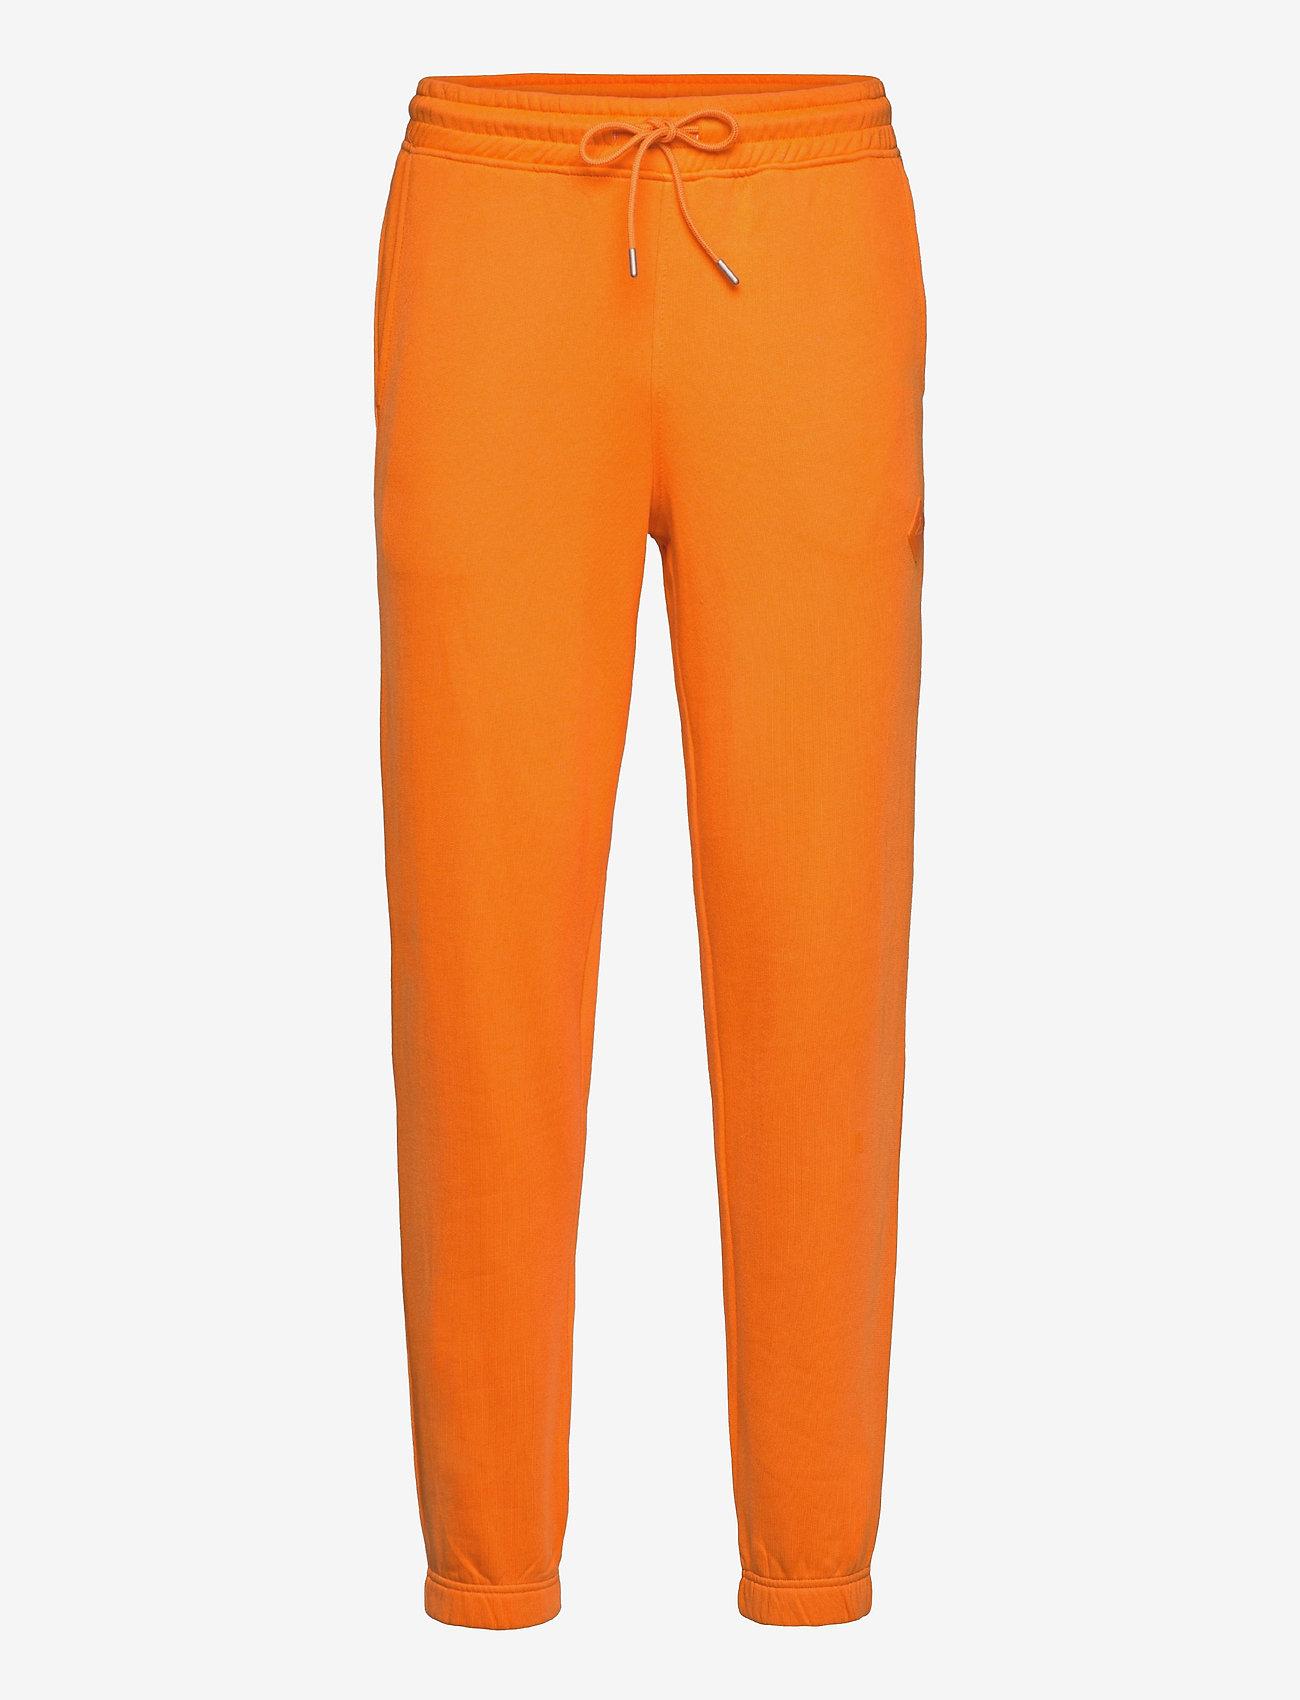 Hanger by Holzweiler - Hanger Trousers - neue mode - orange 1350 - 1